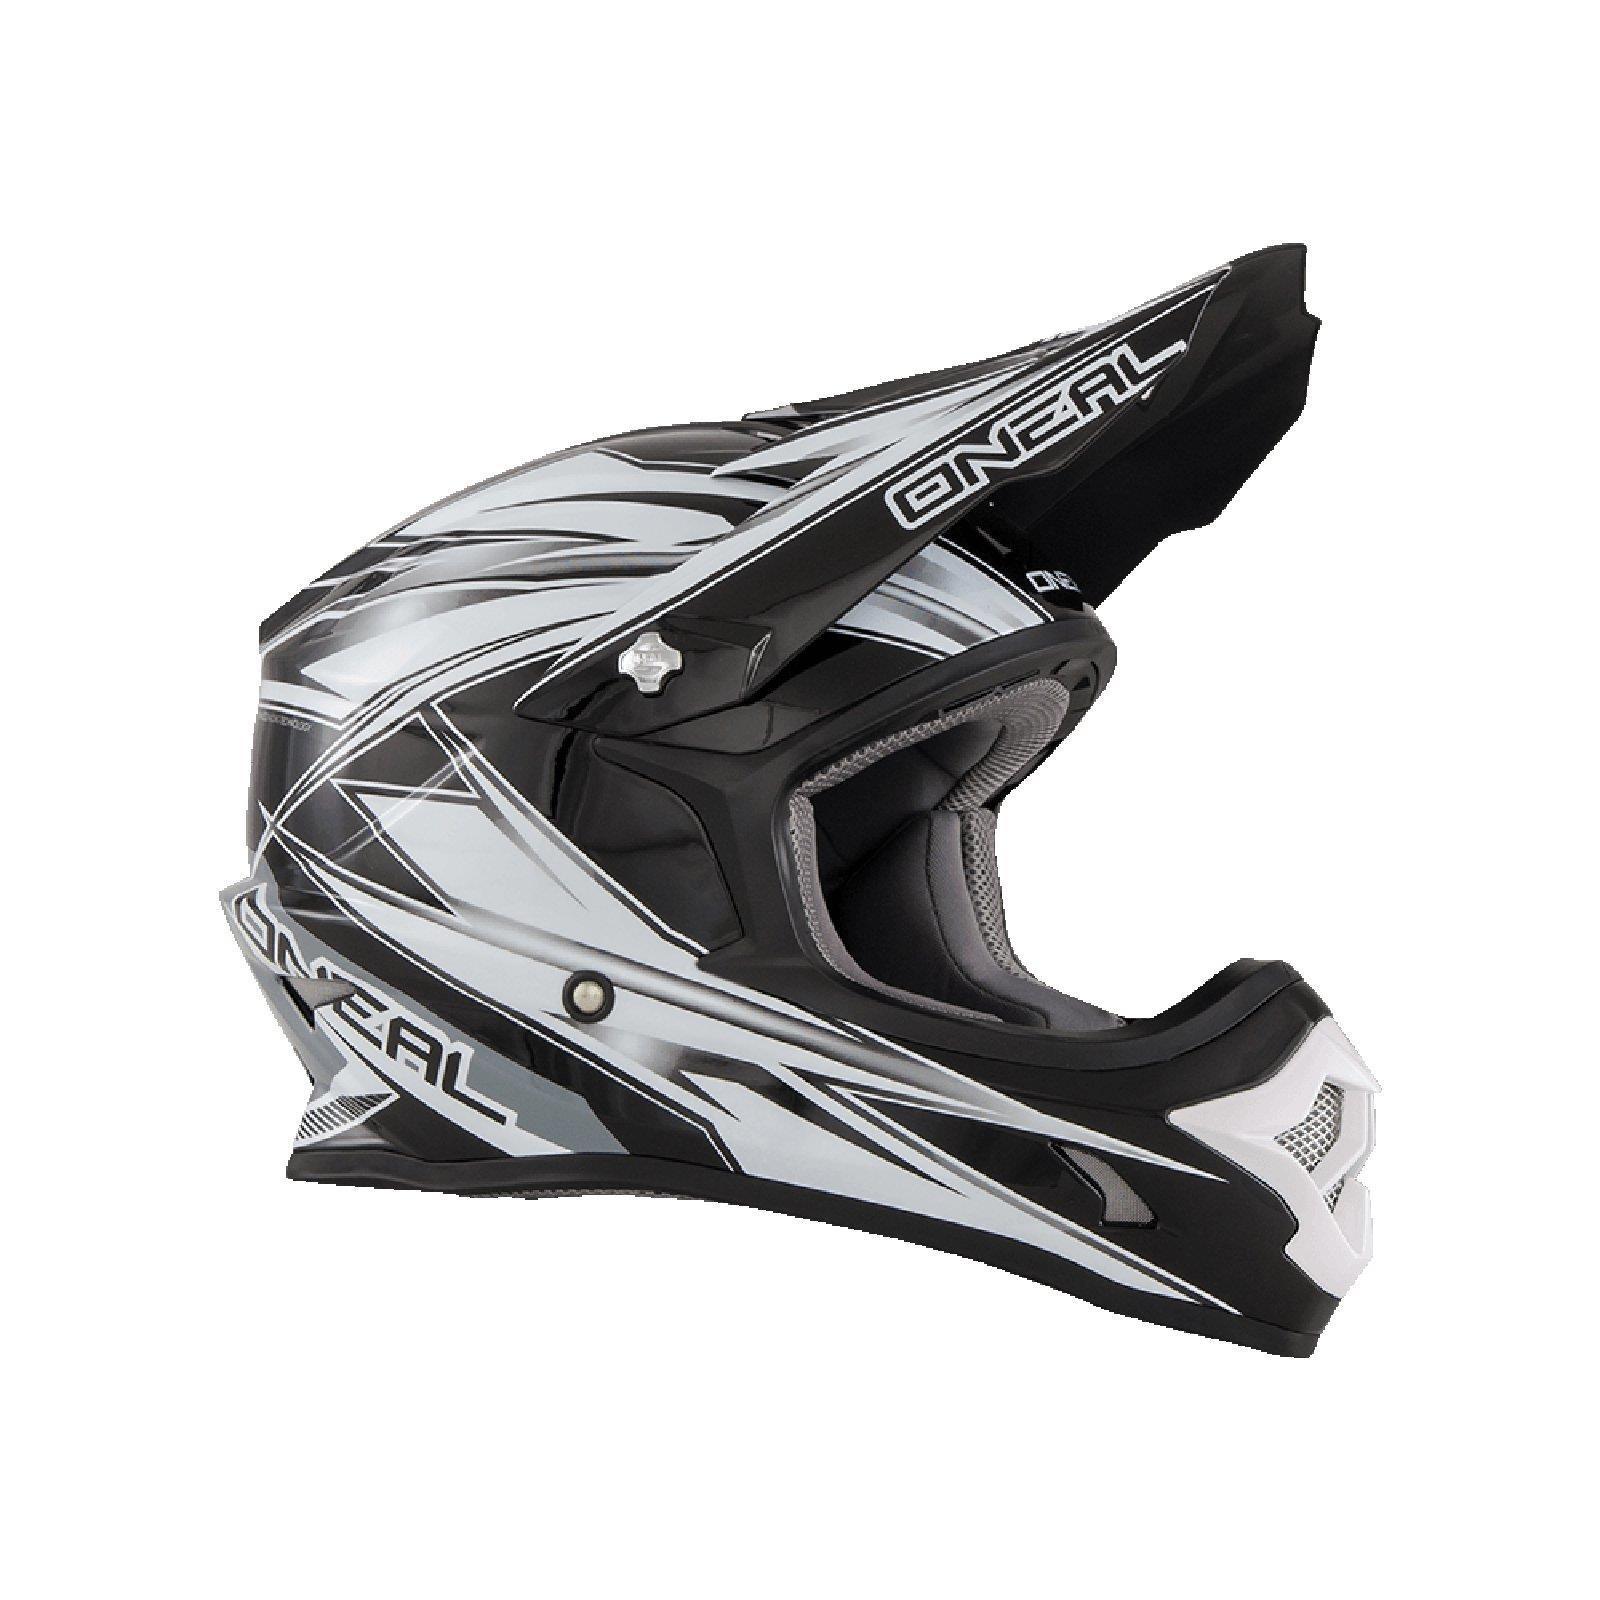 ONeal-Motocross-casco-MX-ENDURO-MOTO-BICI-FUORISTRADA-CROSS-Series-Adventure miniatura 117